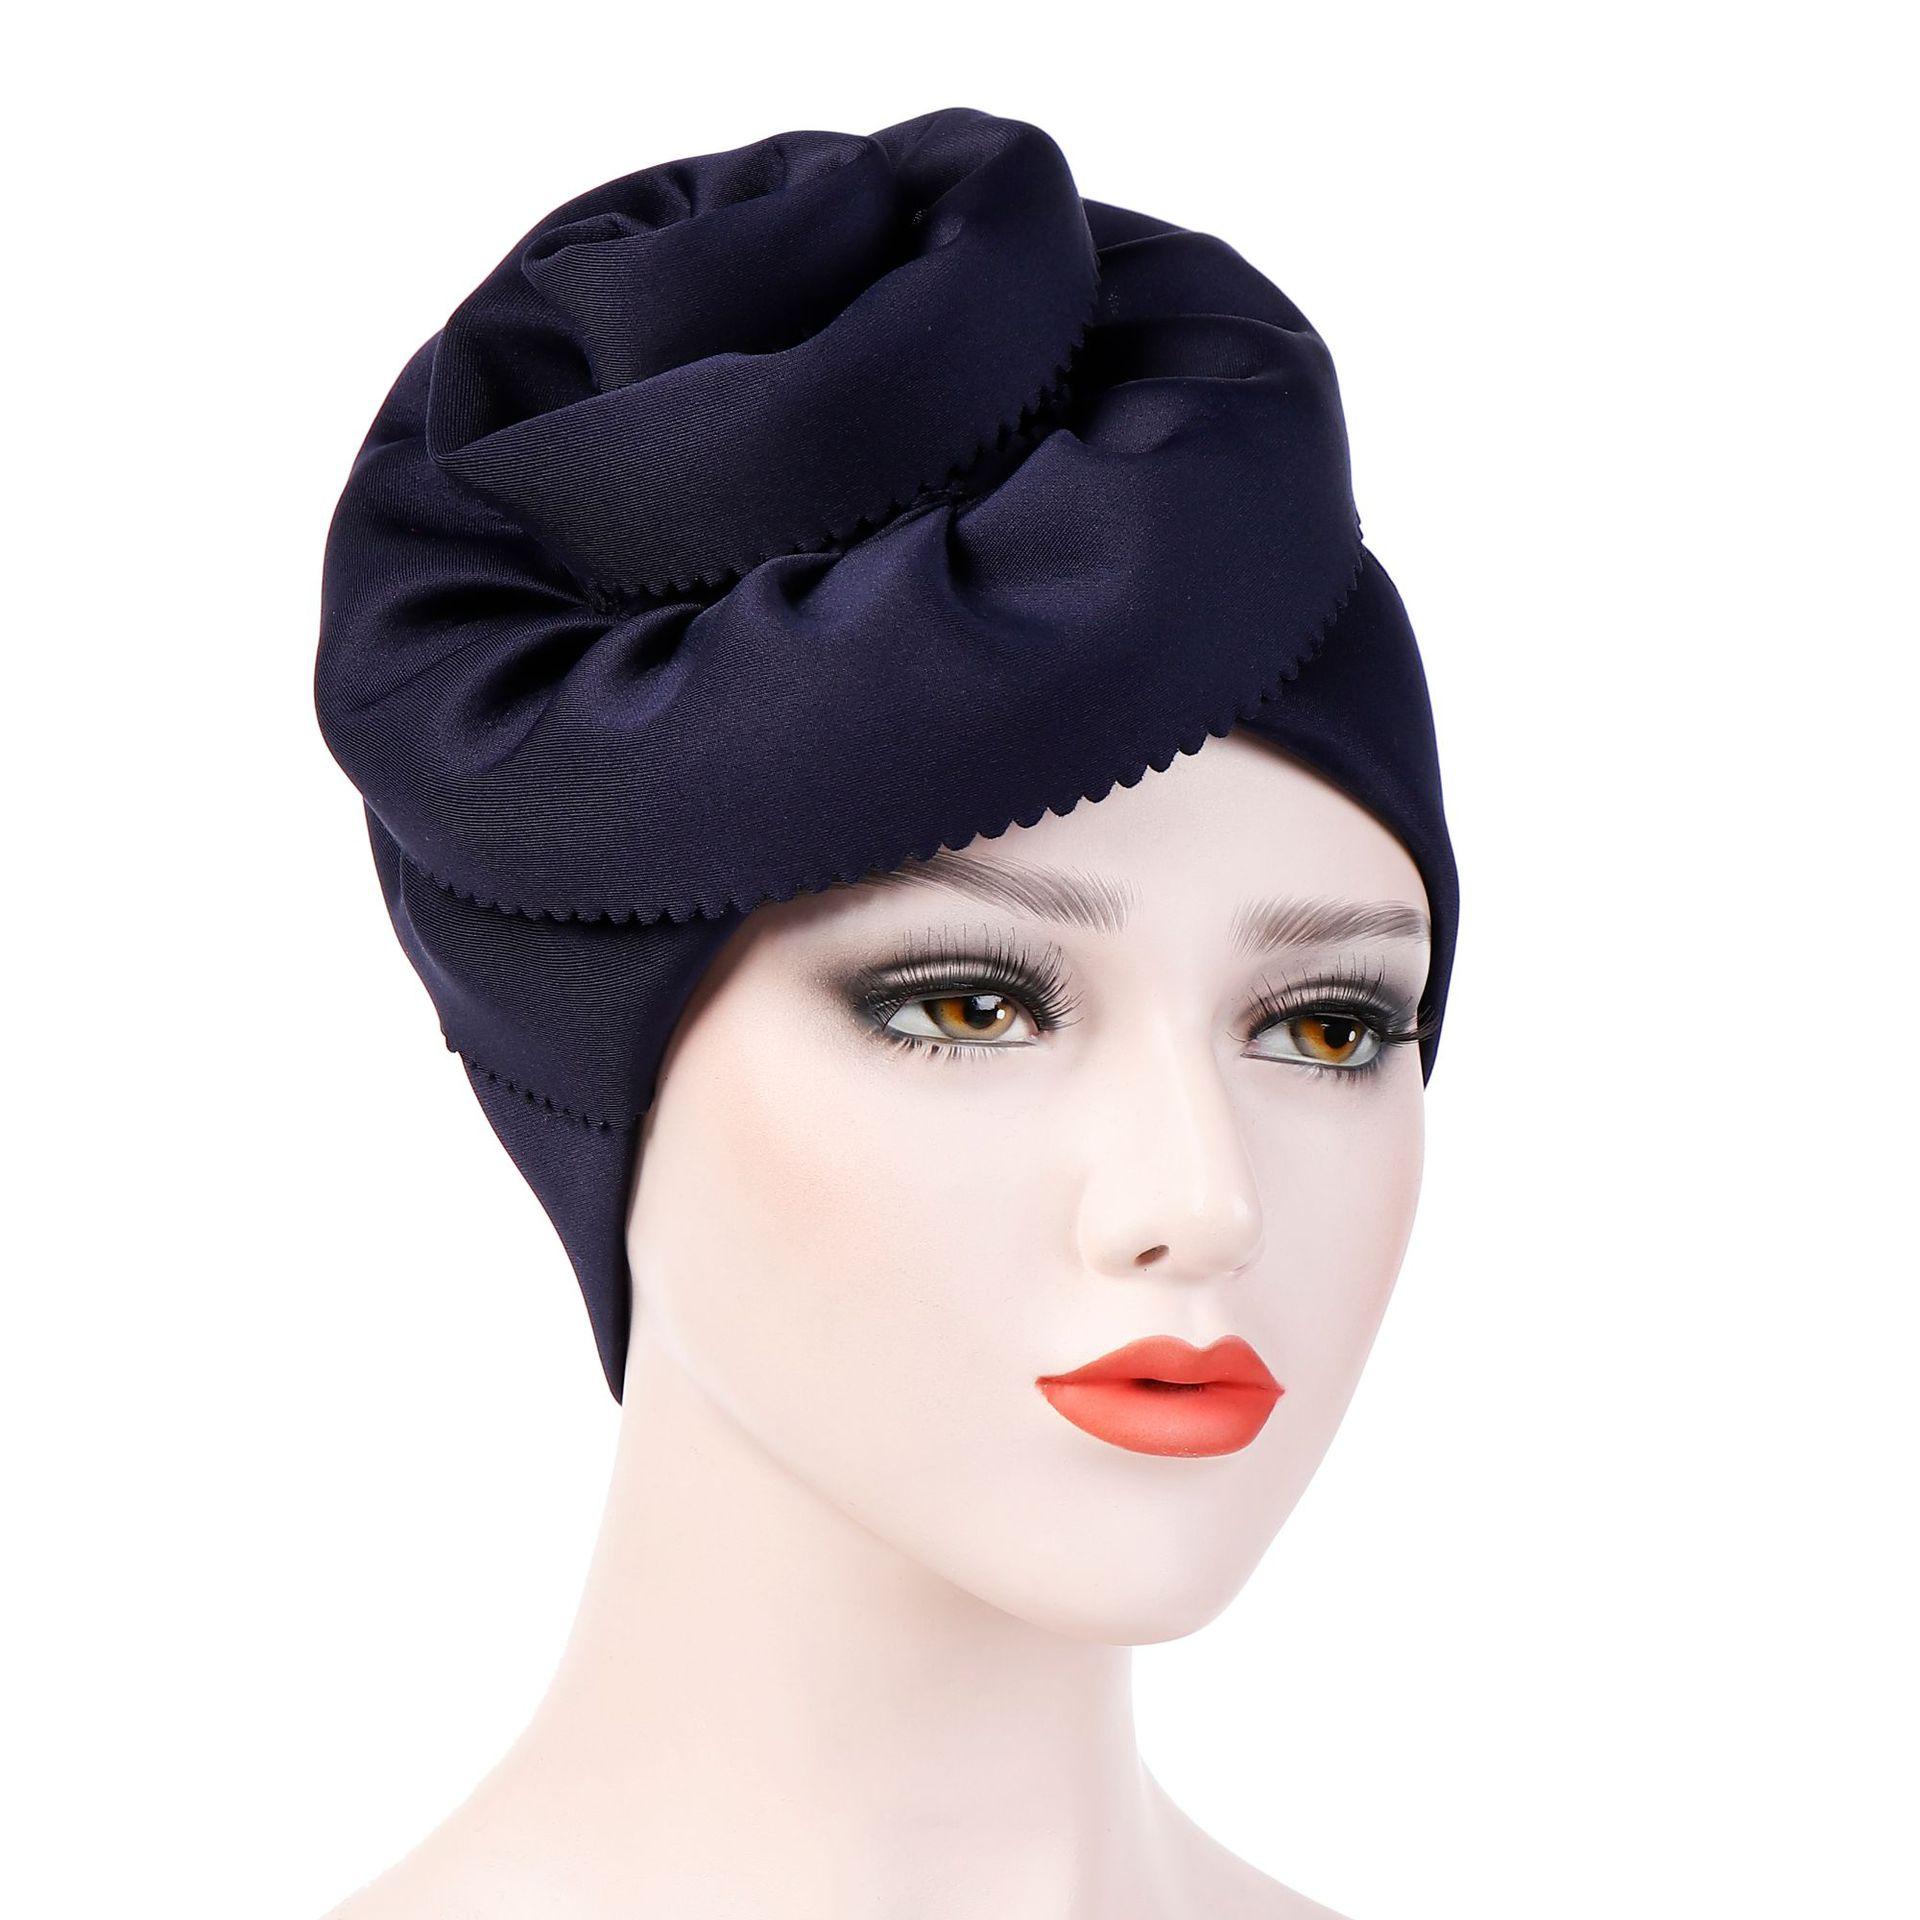 Muslim Hijab Caps Winter Hats For Women Hat Women Winter Cap Beanies For Ladies Turban Hijab Woman Hats Winter Accessories